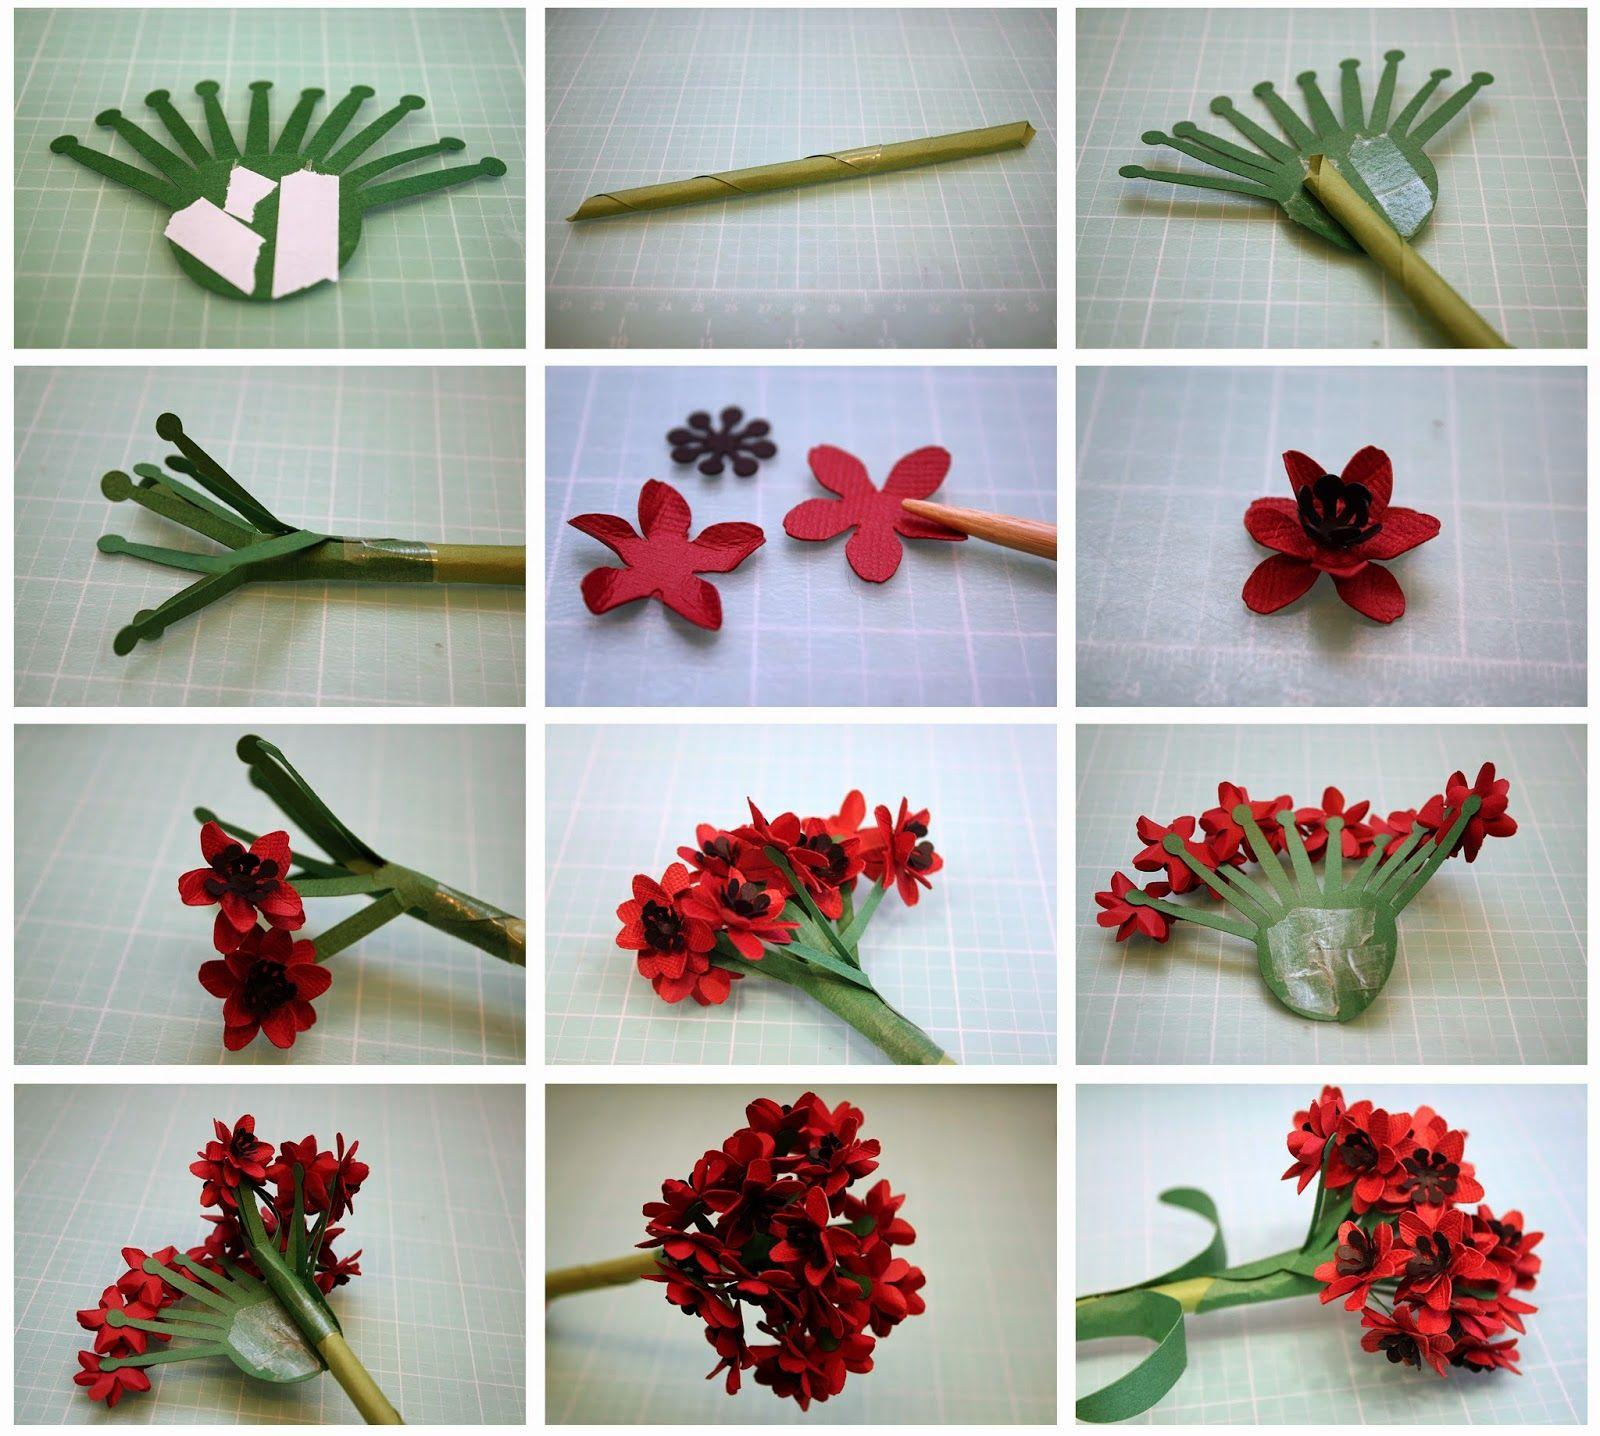 Bits Of Paper Ixora And Geranium 3d Paper Flowers And A 3d Planter